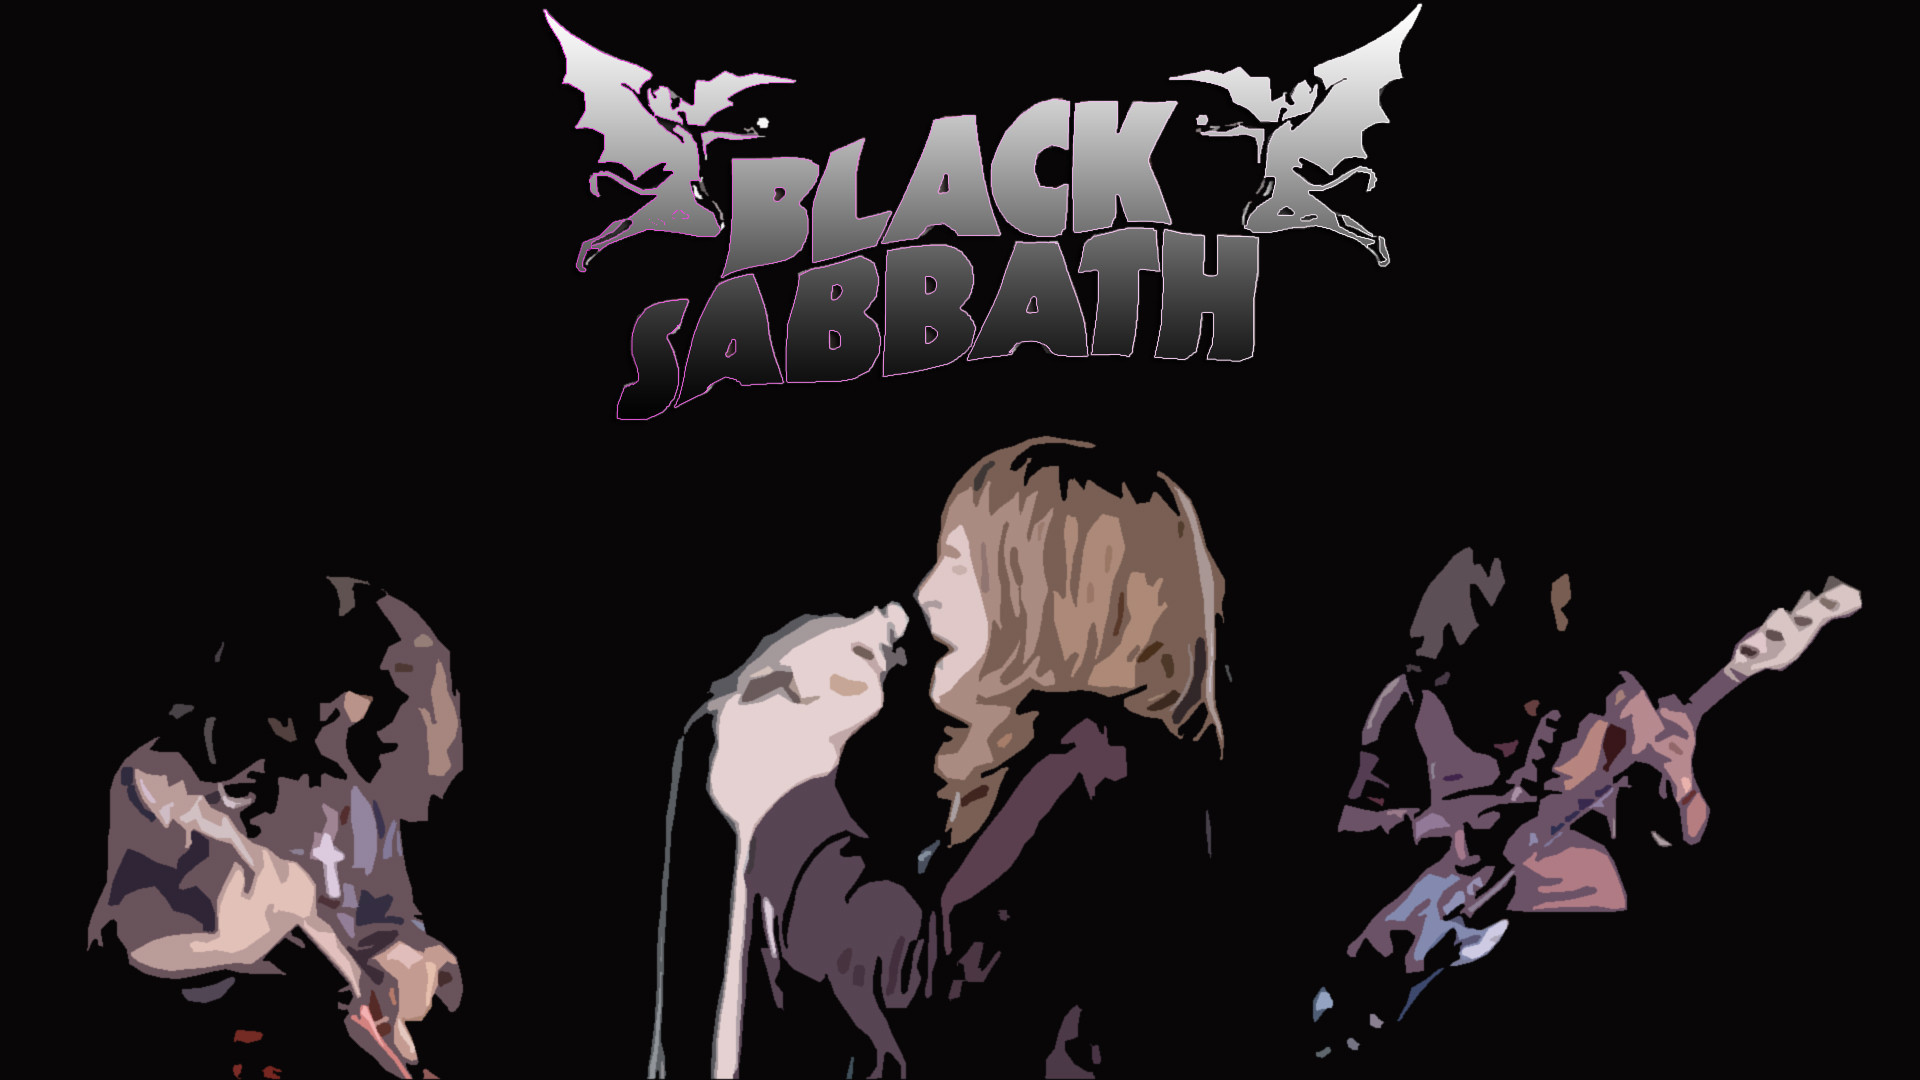 Music – Black Sabbath Heavy Metal Ozzy Osbourne Wallpaper